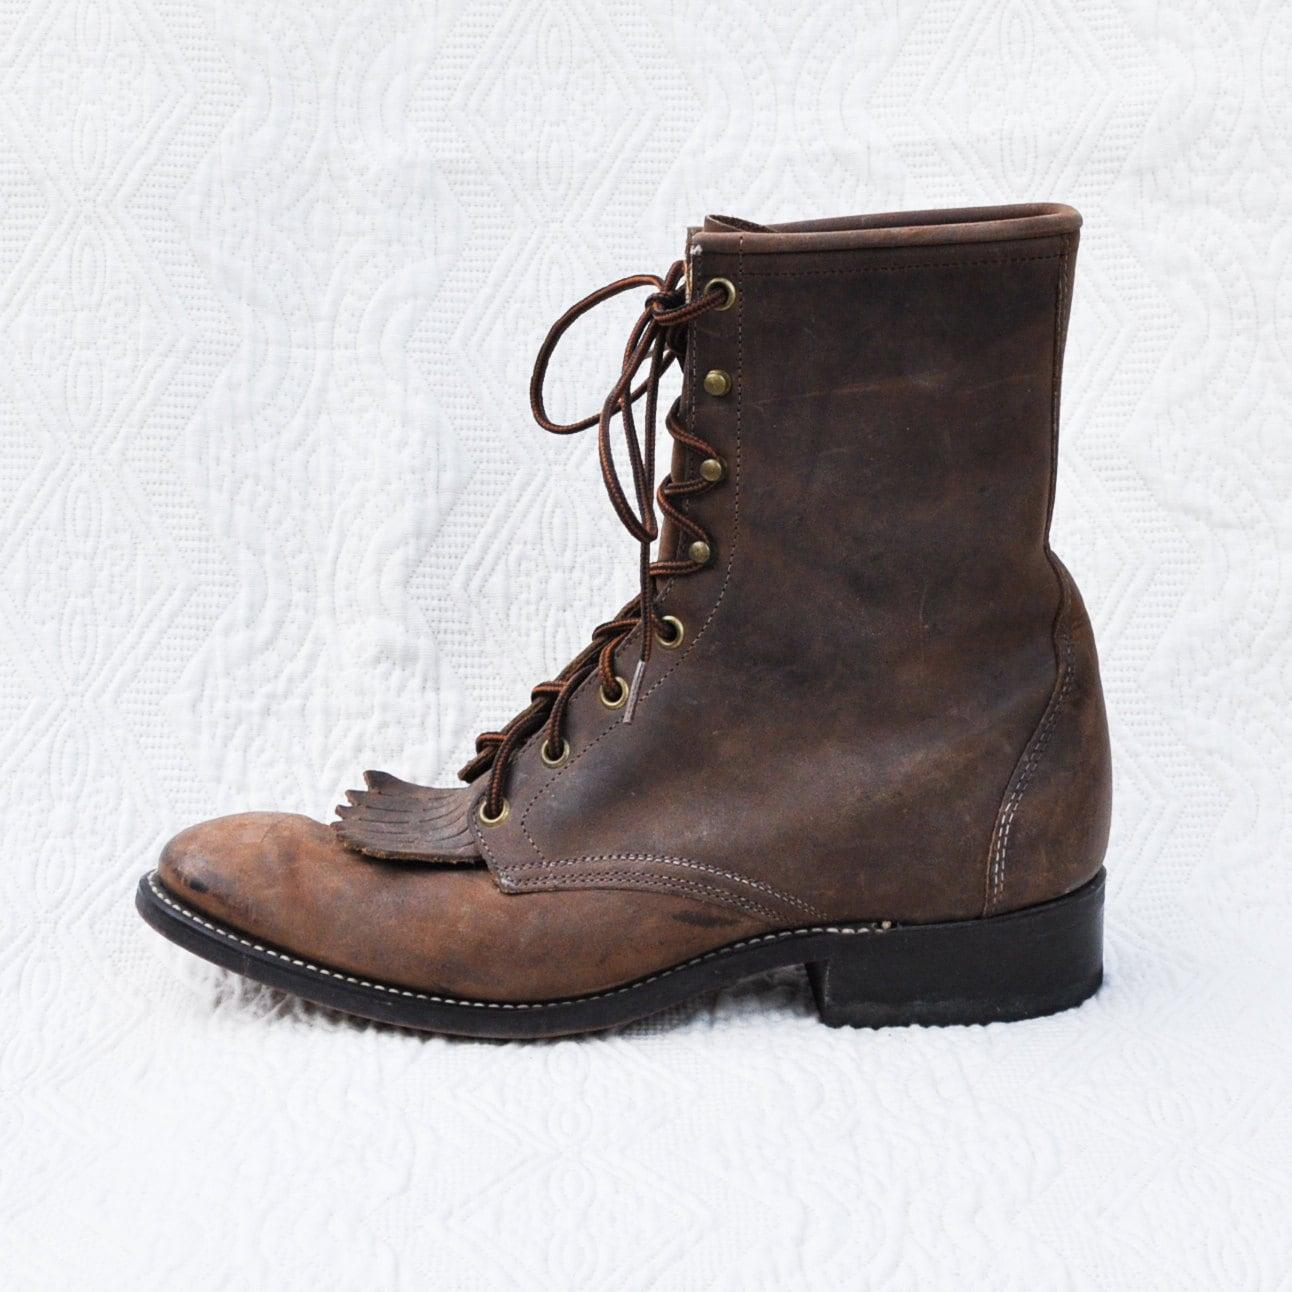 vintage brown suede roper boots mens us 8 5 by